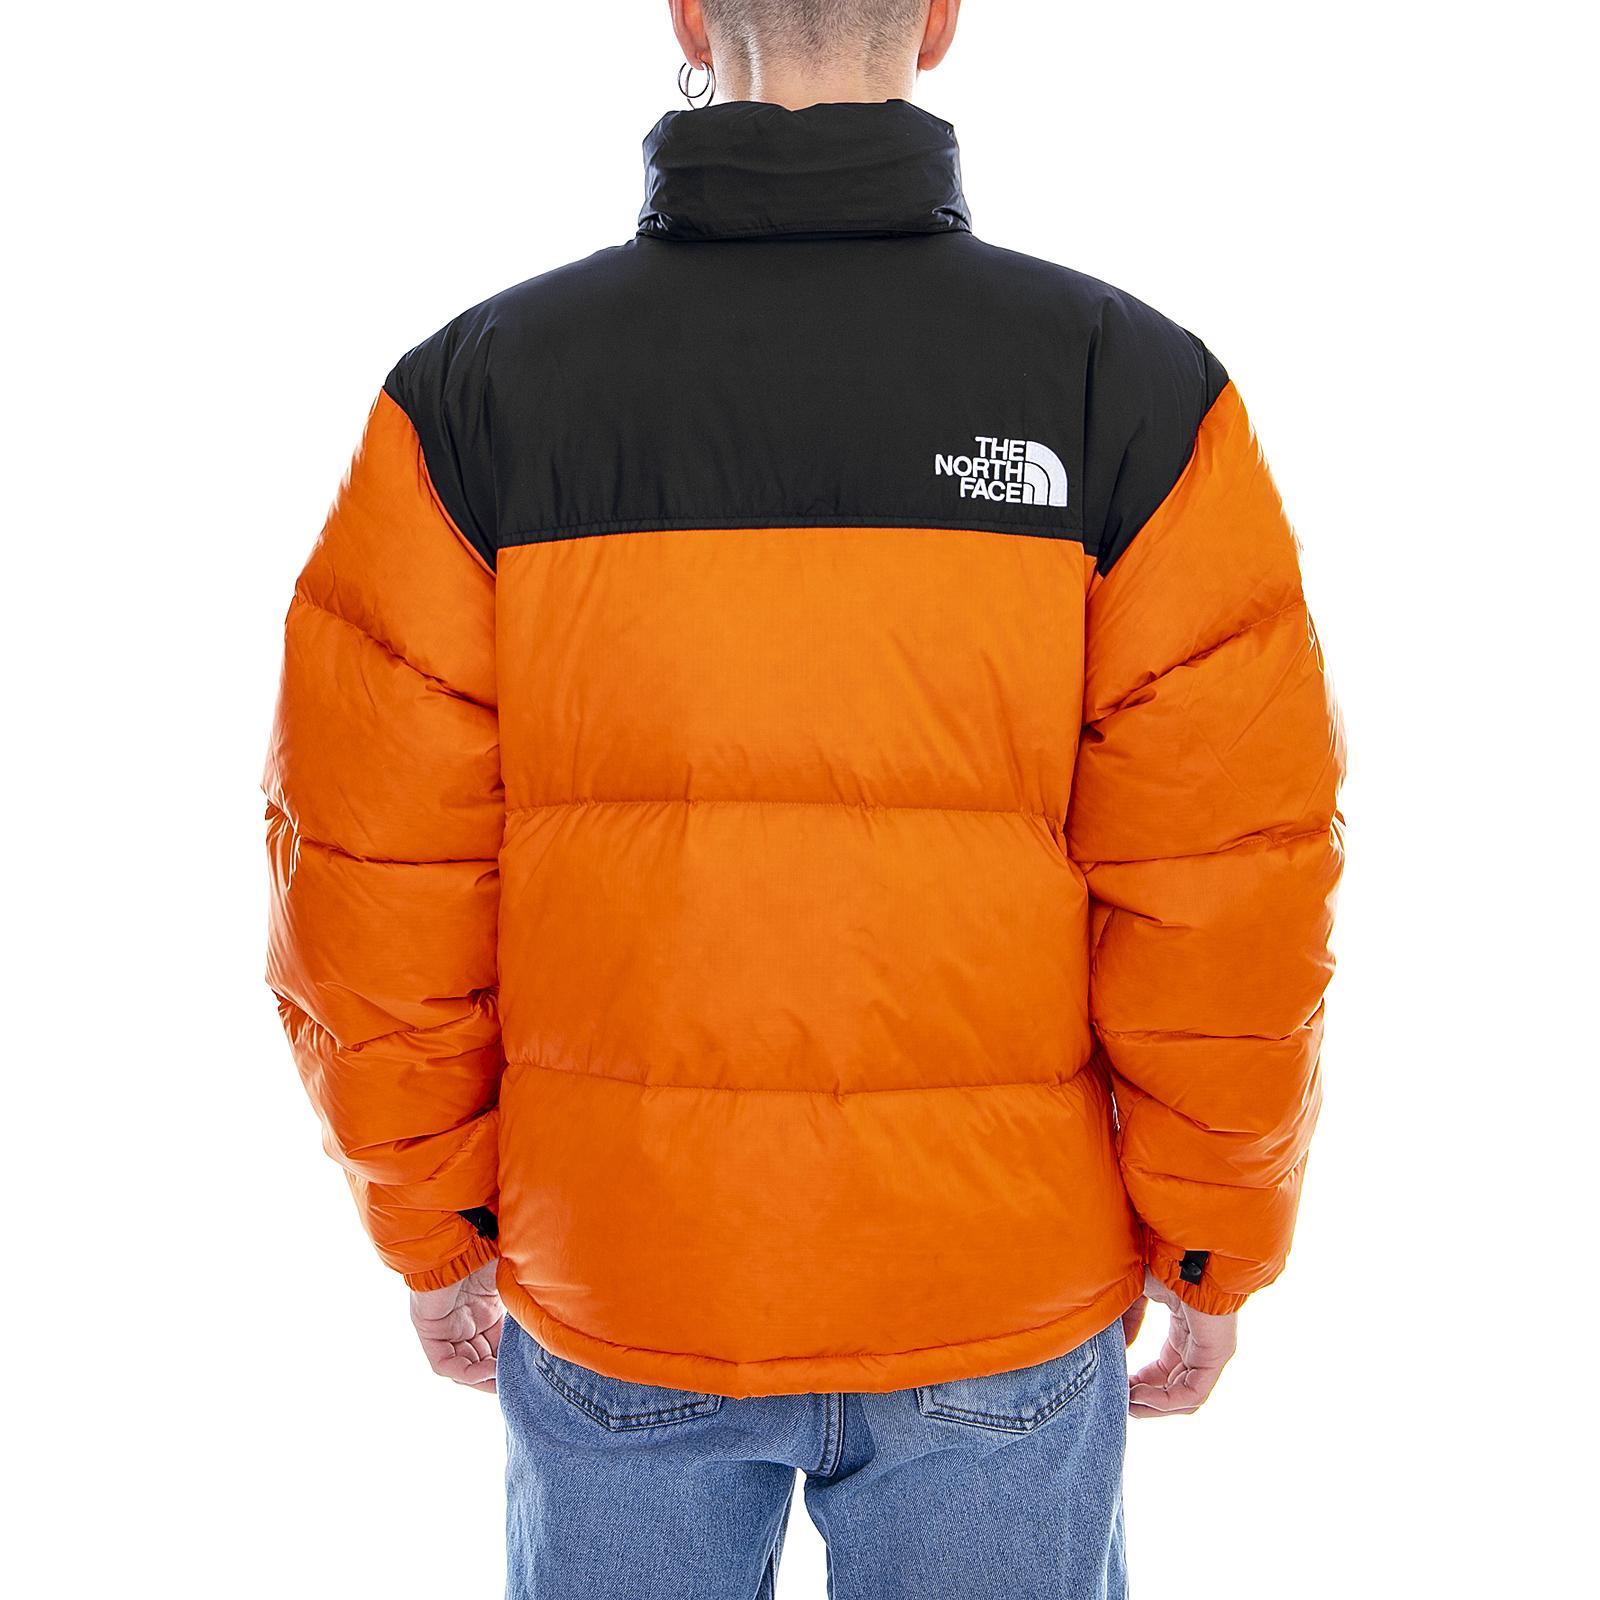 The North Face Giacche M 1996 Rto Nptse Jkt Persian Orange Arancione ... c17475b4c